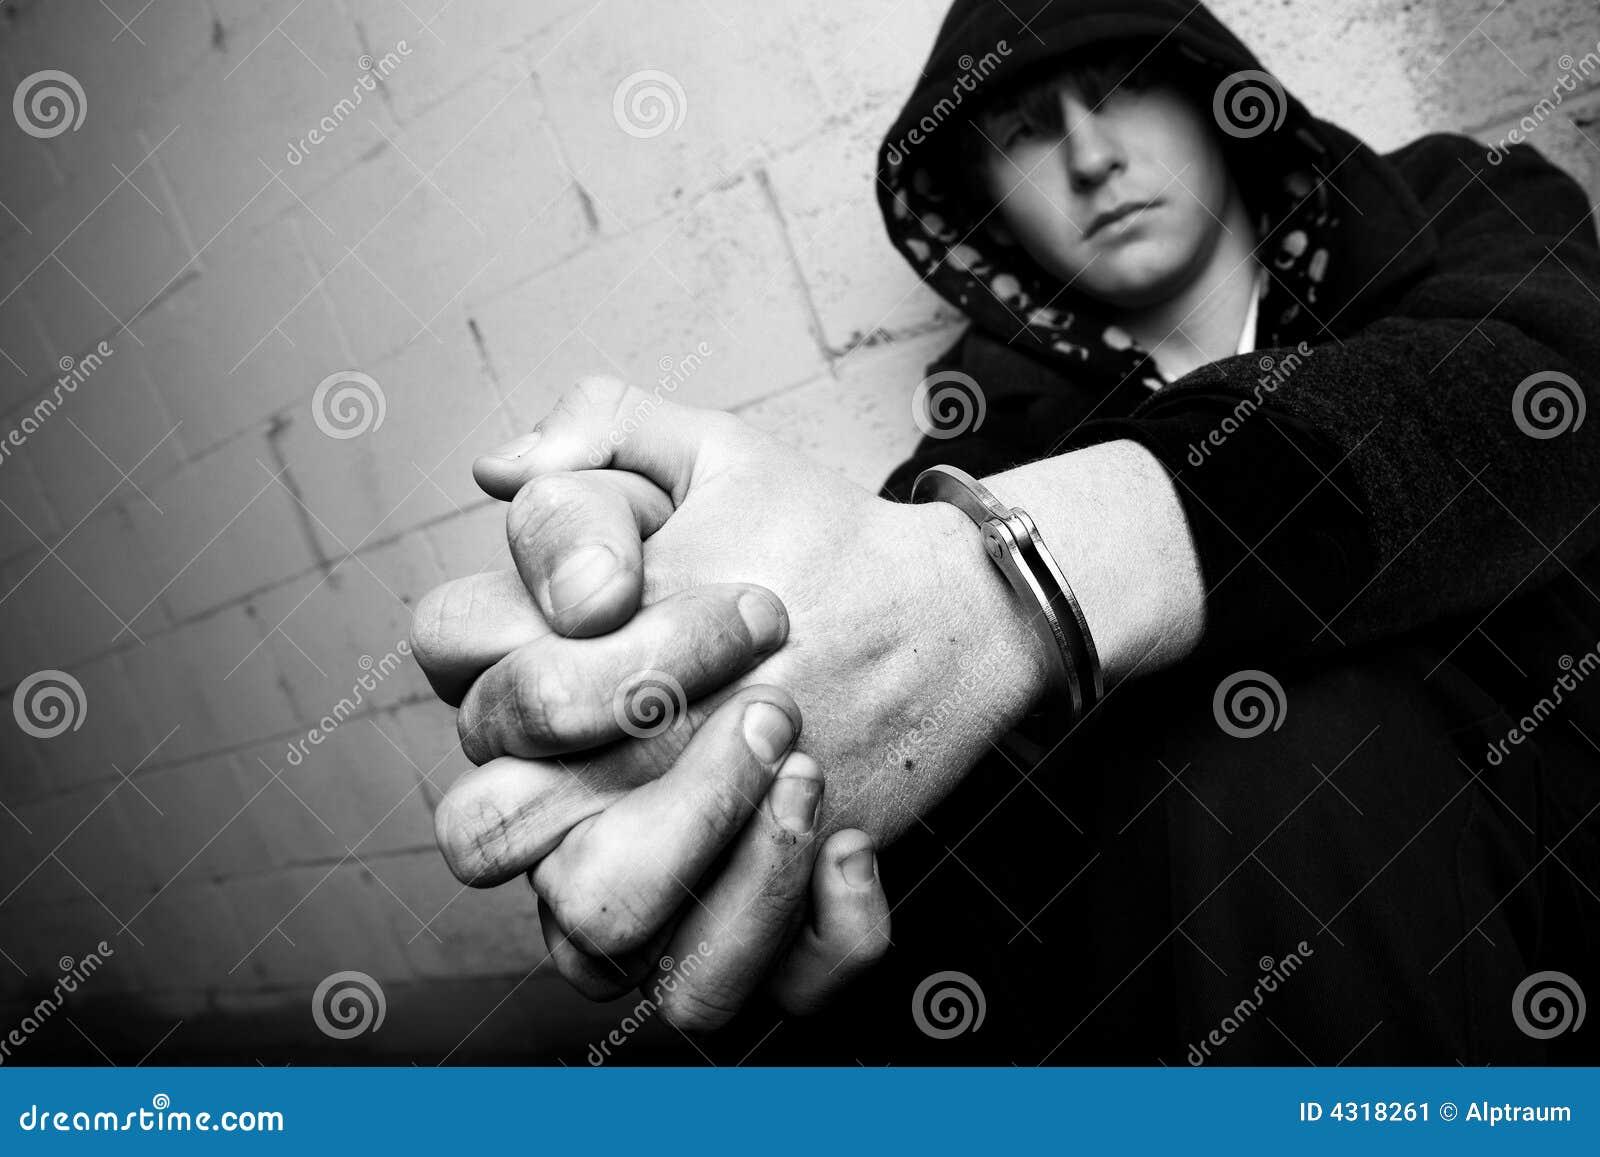 Teen in handcuffs